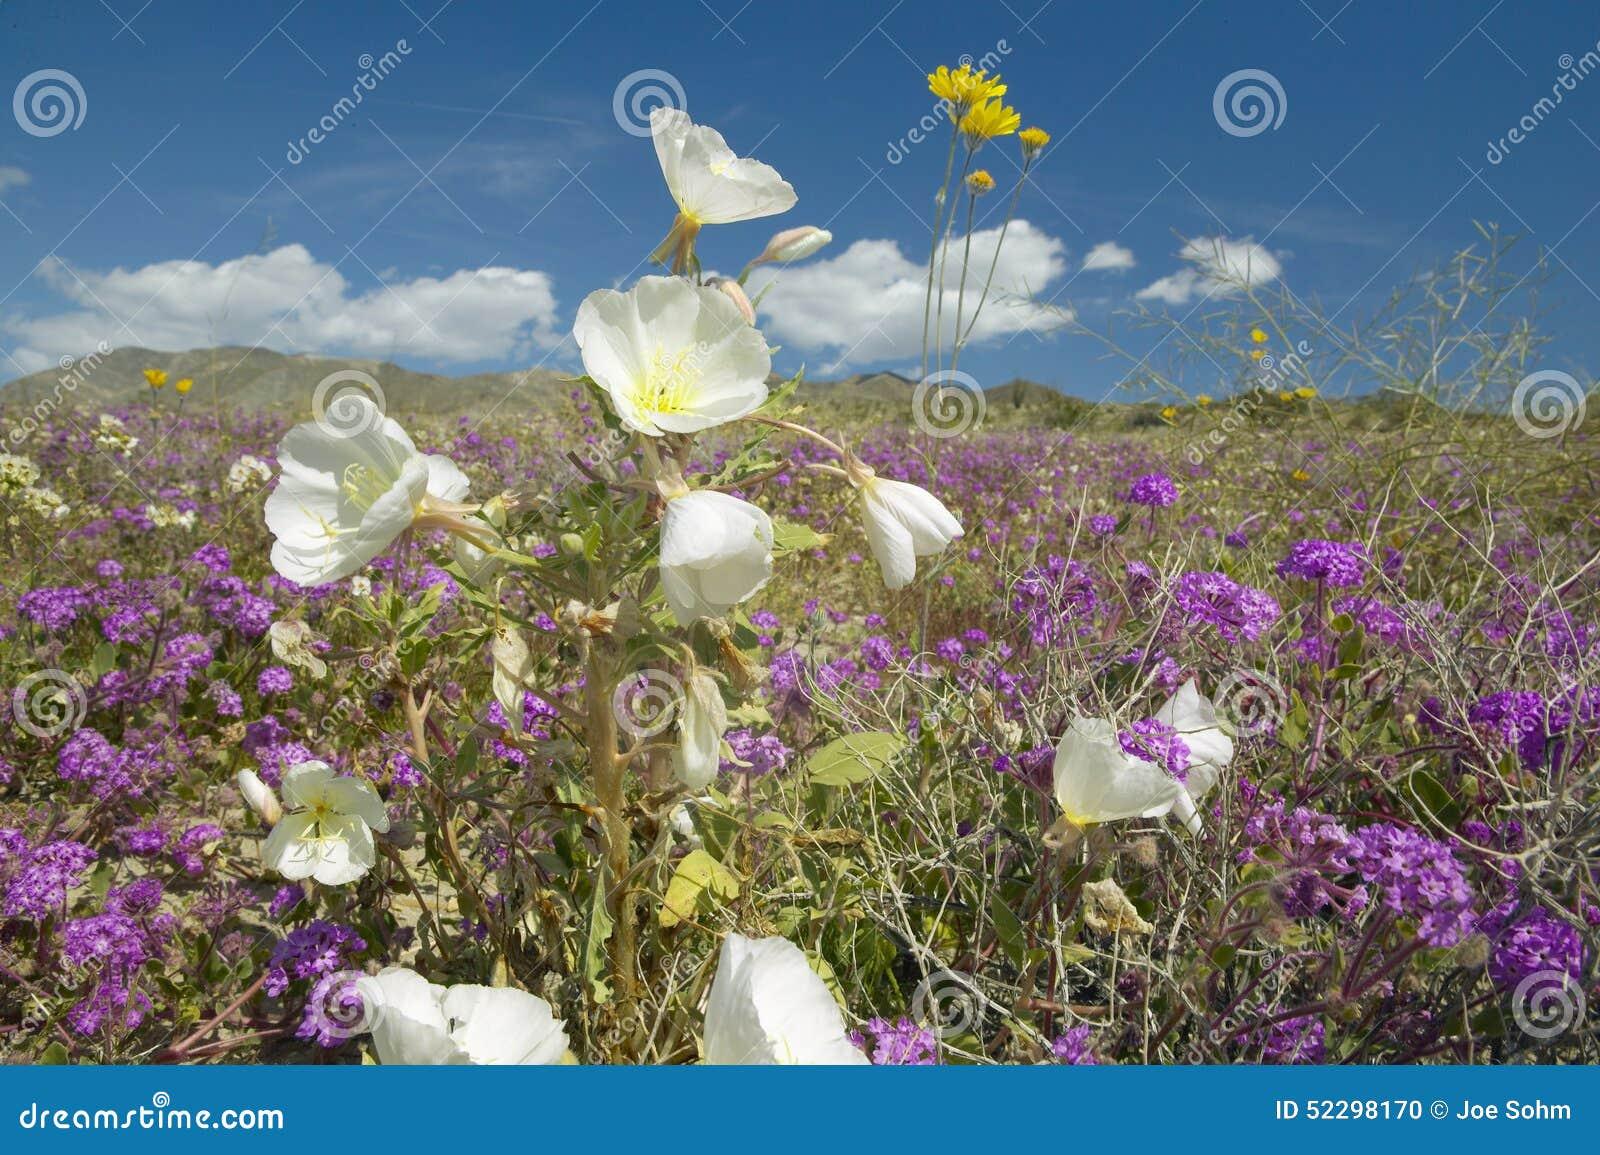 Desert lilies and white flowers blossoming with white puffy clouds download desert lilies and white flowers blossoming with white puffy clouds in anza borrego desert mightylinksfo